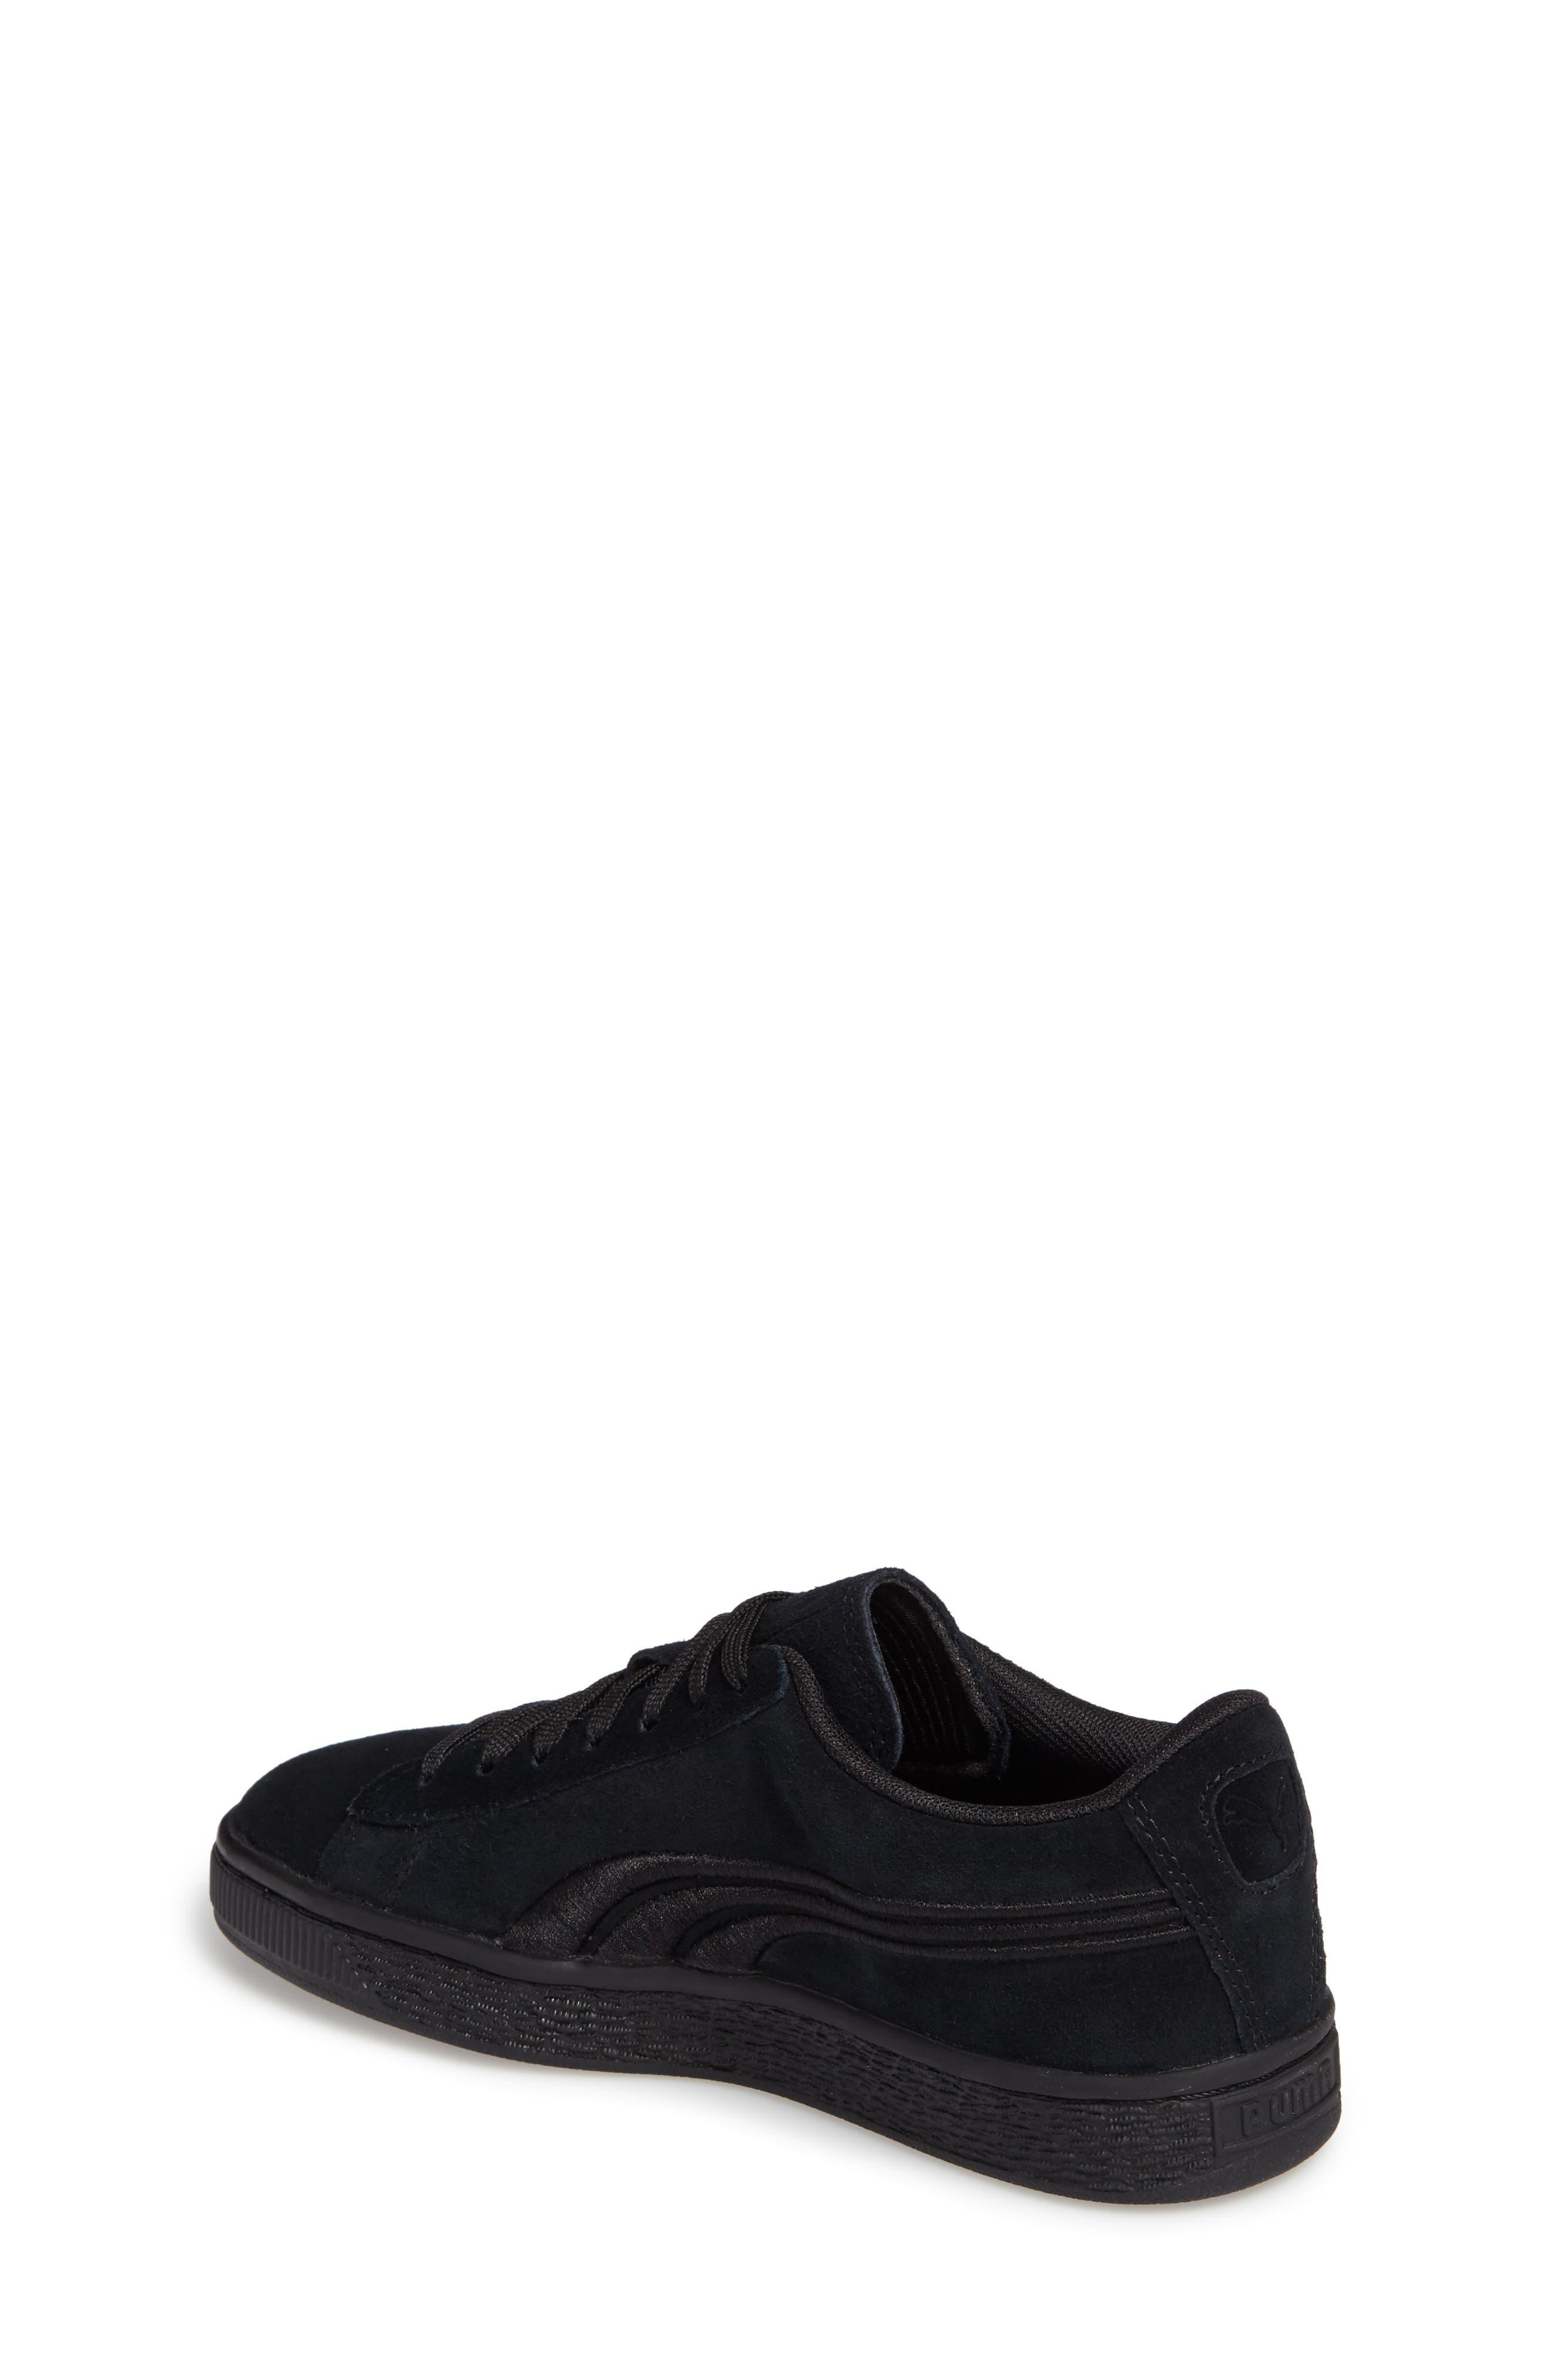 Suede Classic Badge Jr. Sneaker,                             Alternate thumbnail 2, color,                             Black/ Black